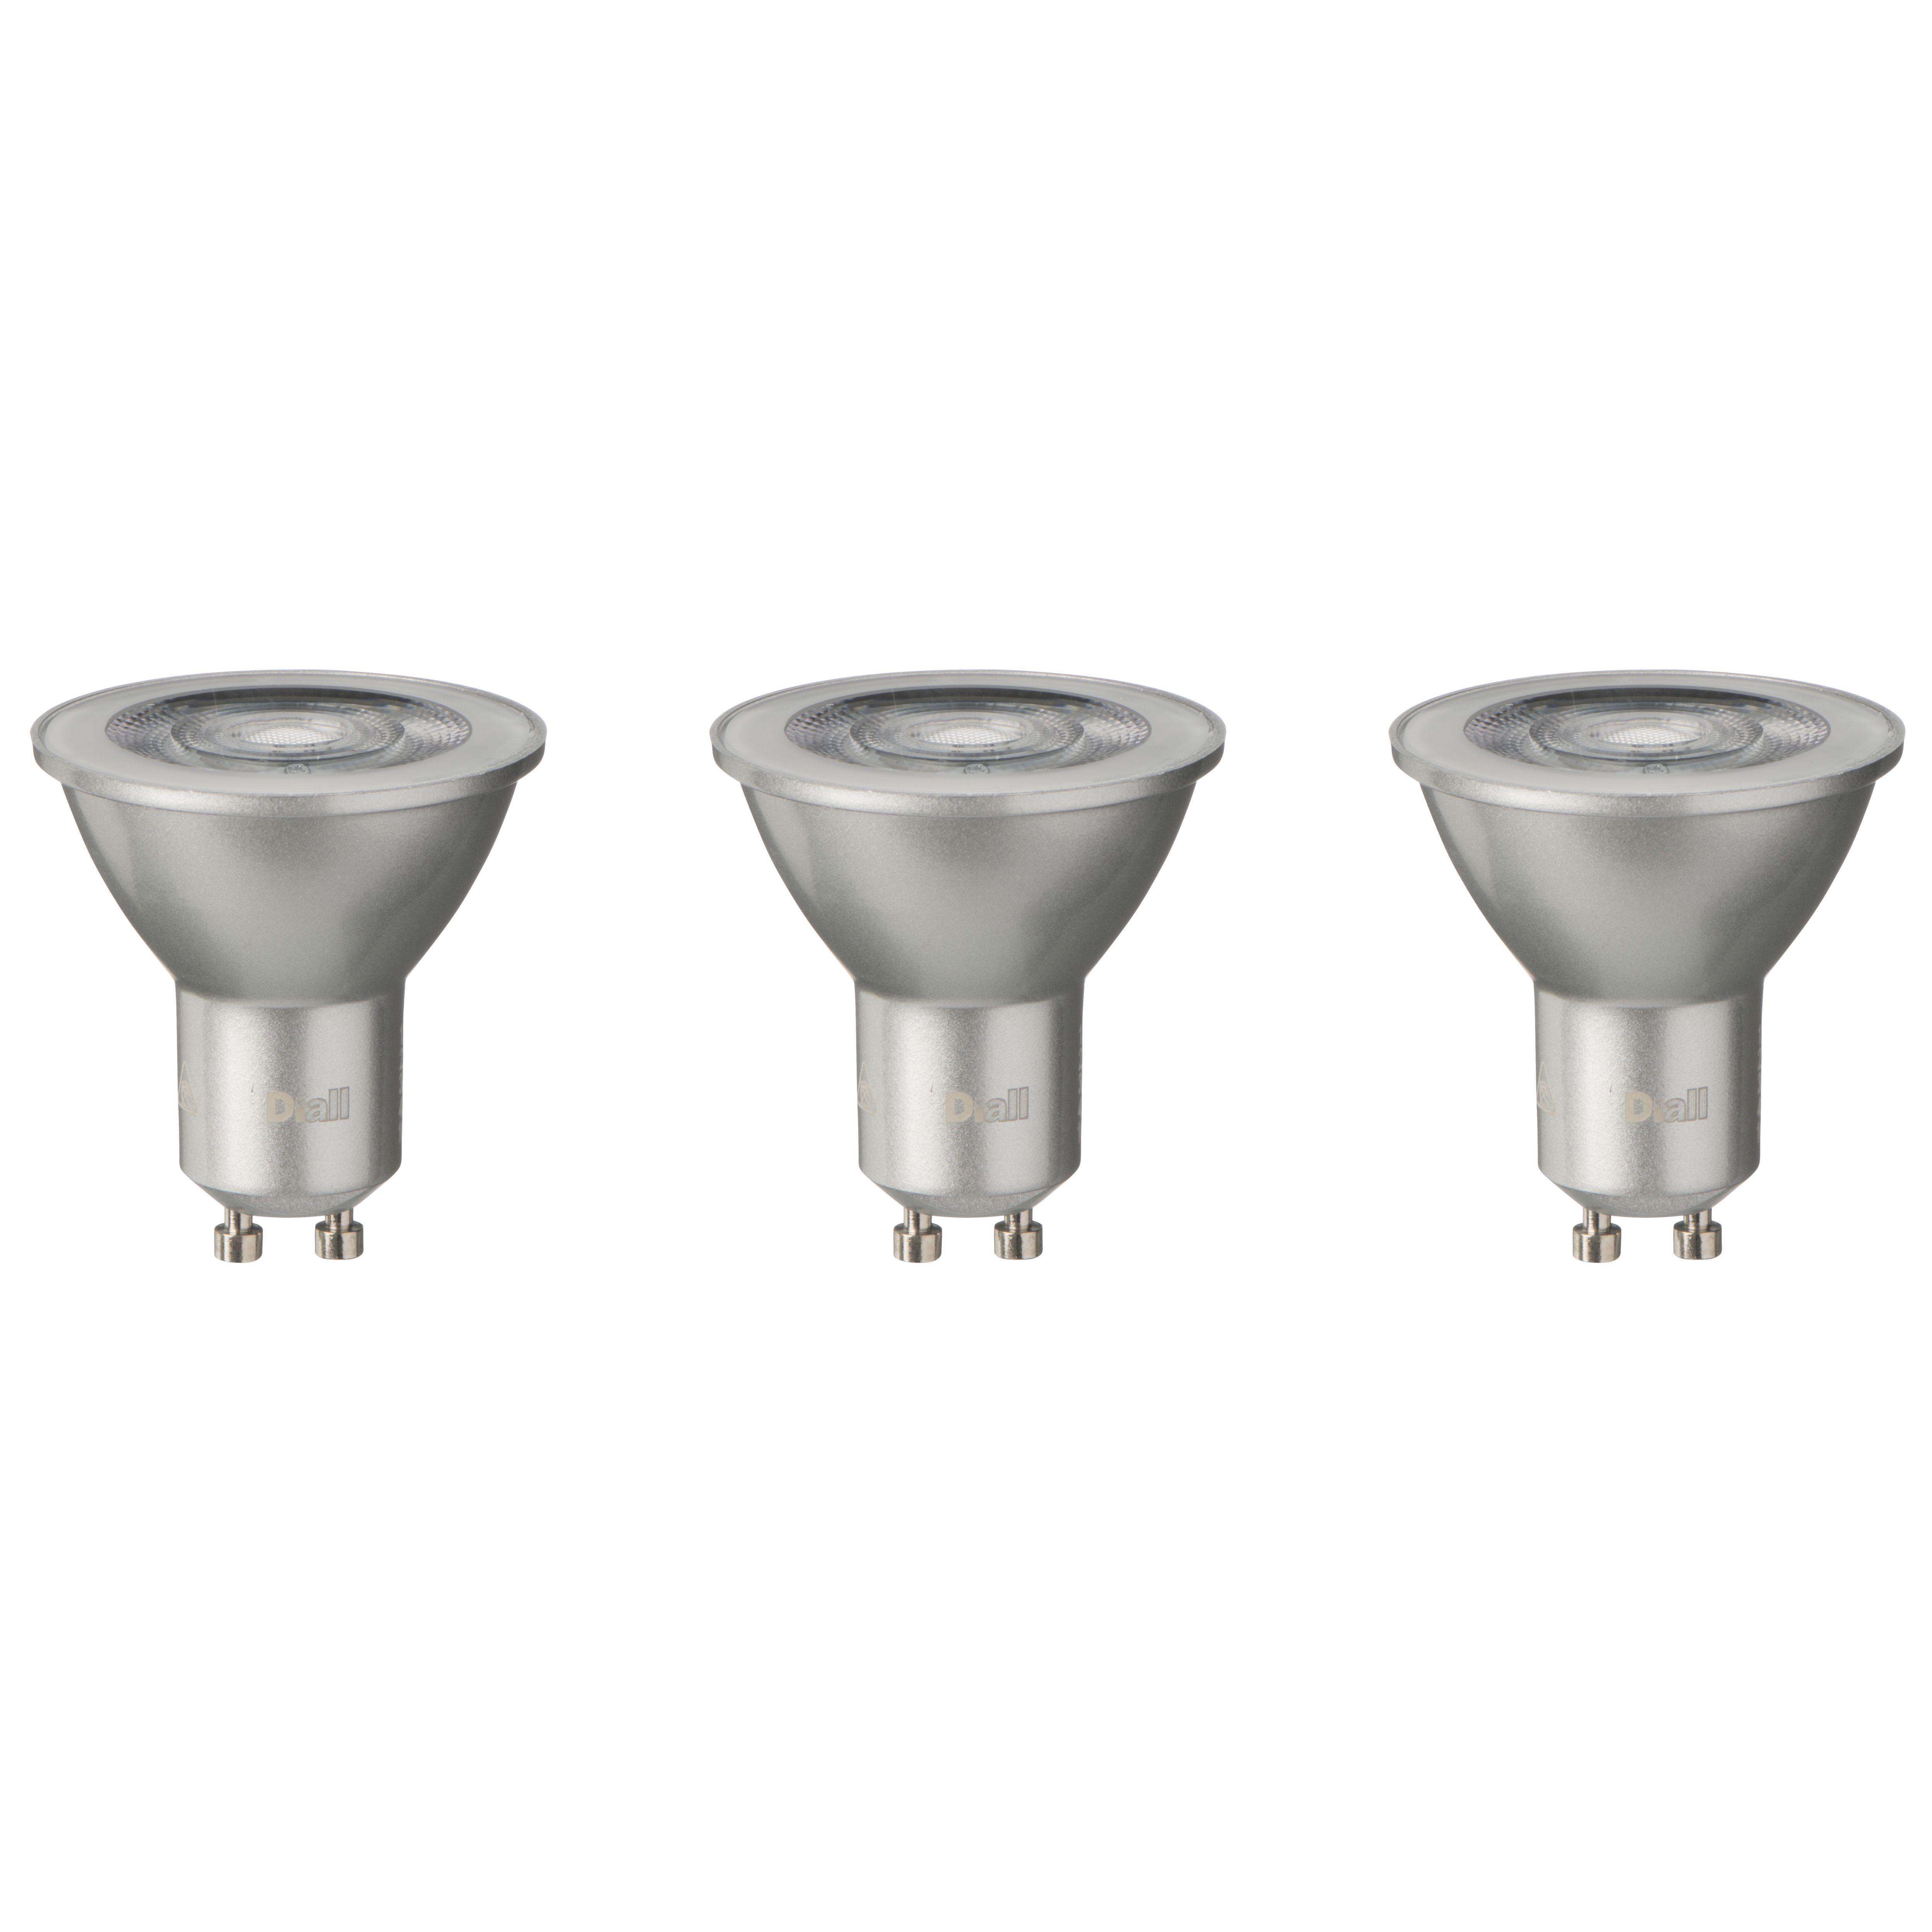 Diall Gu10 345lm Led Reflector Light Bulb, Pack Of 3